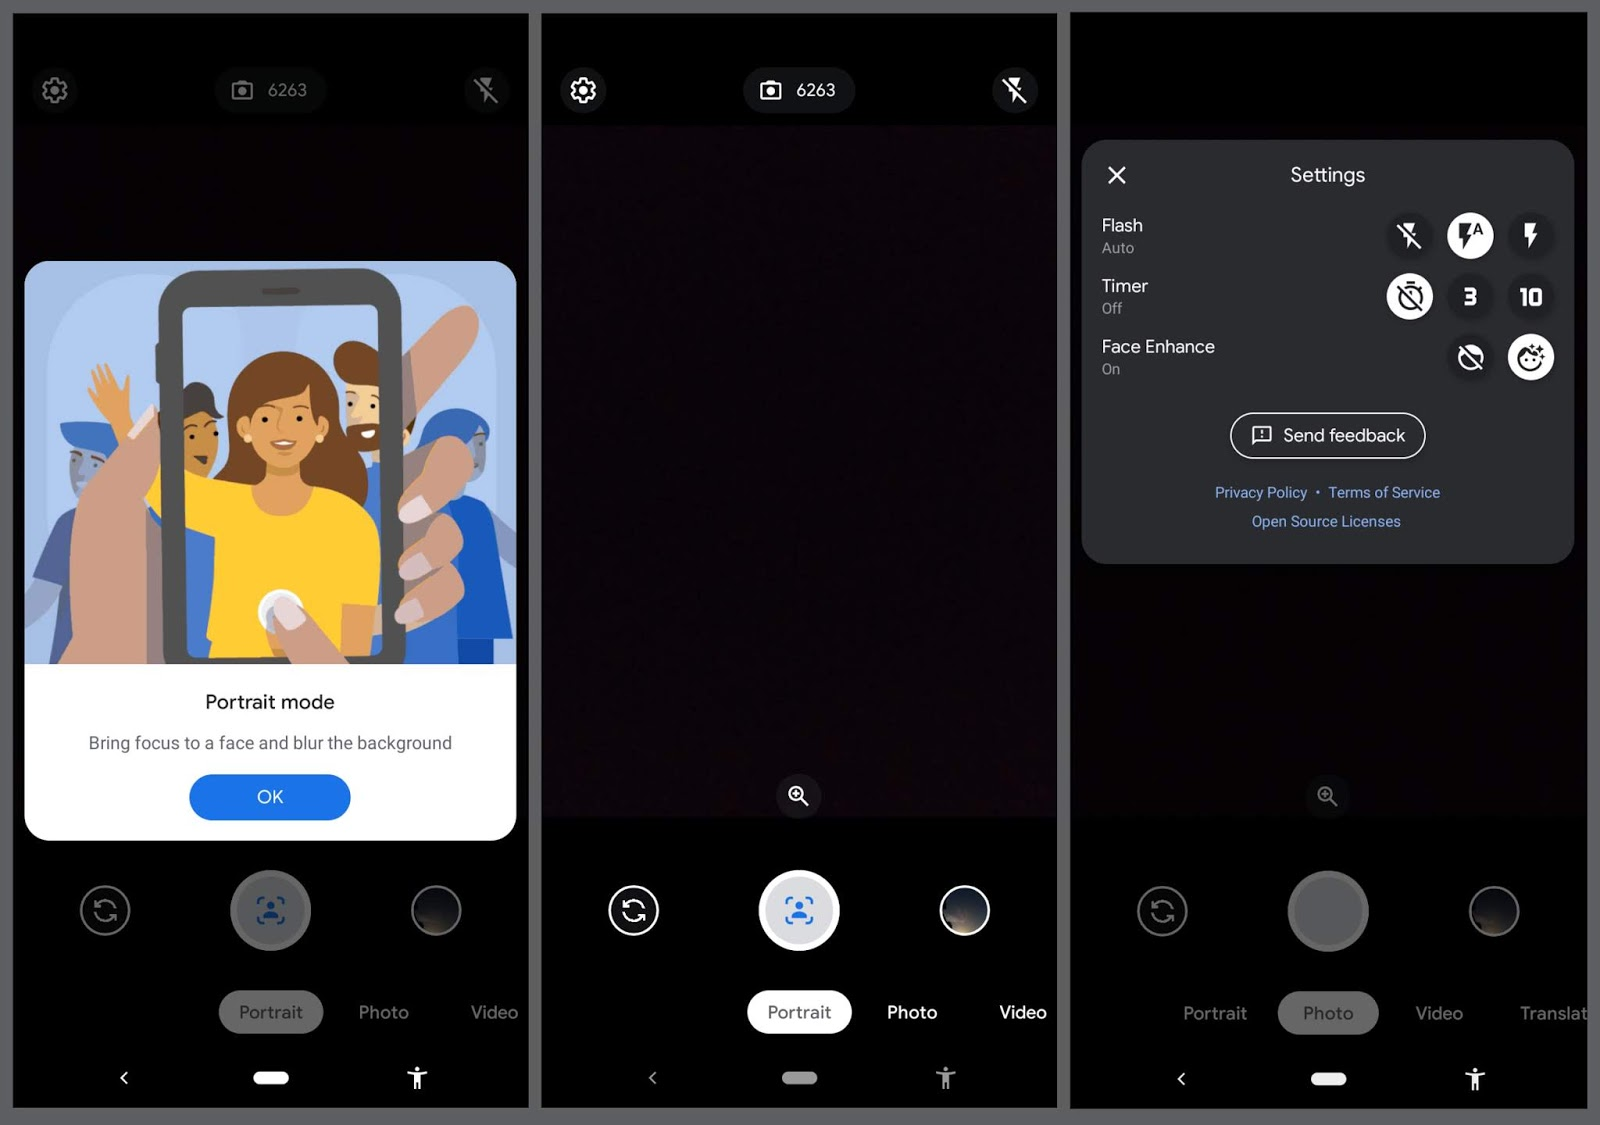 Google Camera - Android App